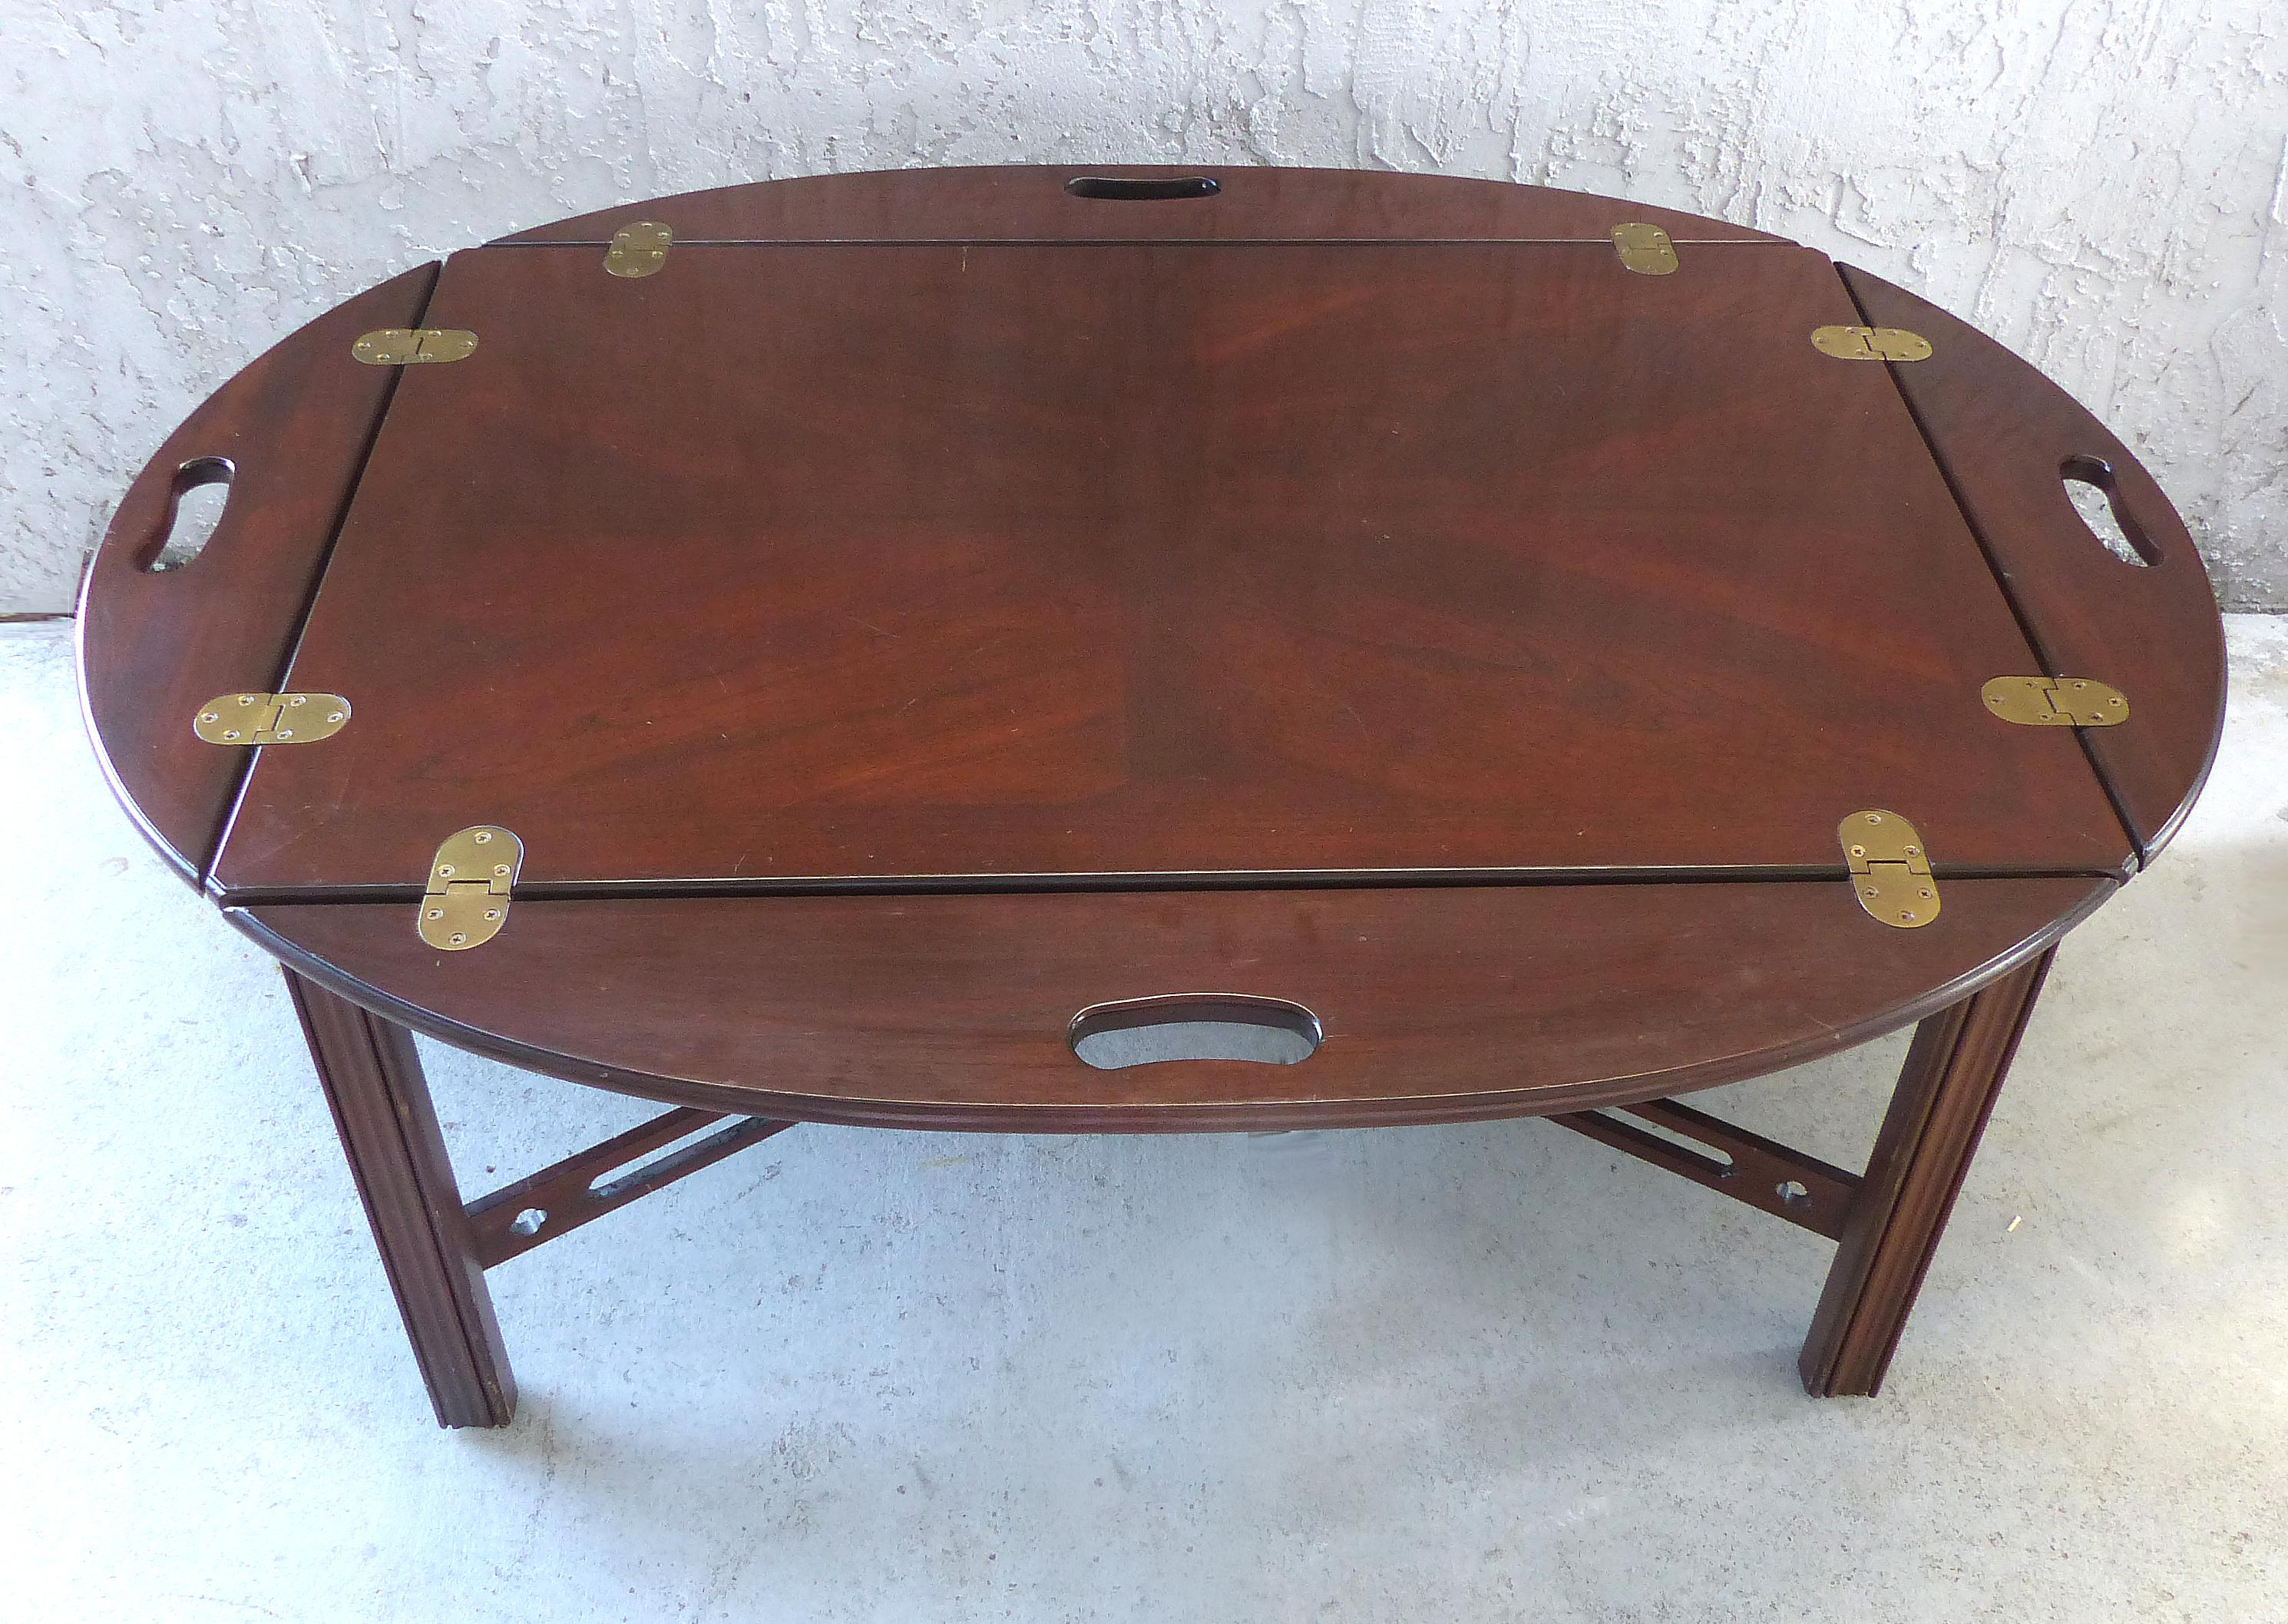 Ethan Allen Butler Tray Coffee Table Chairish